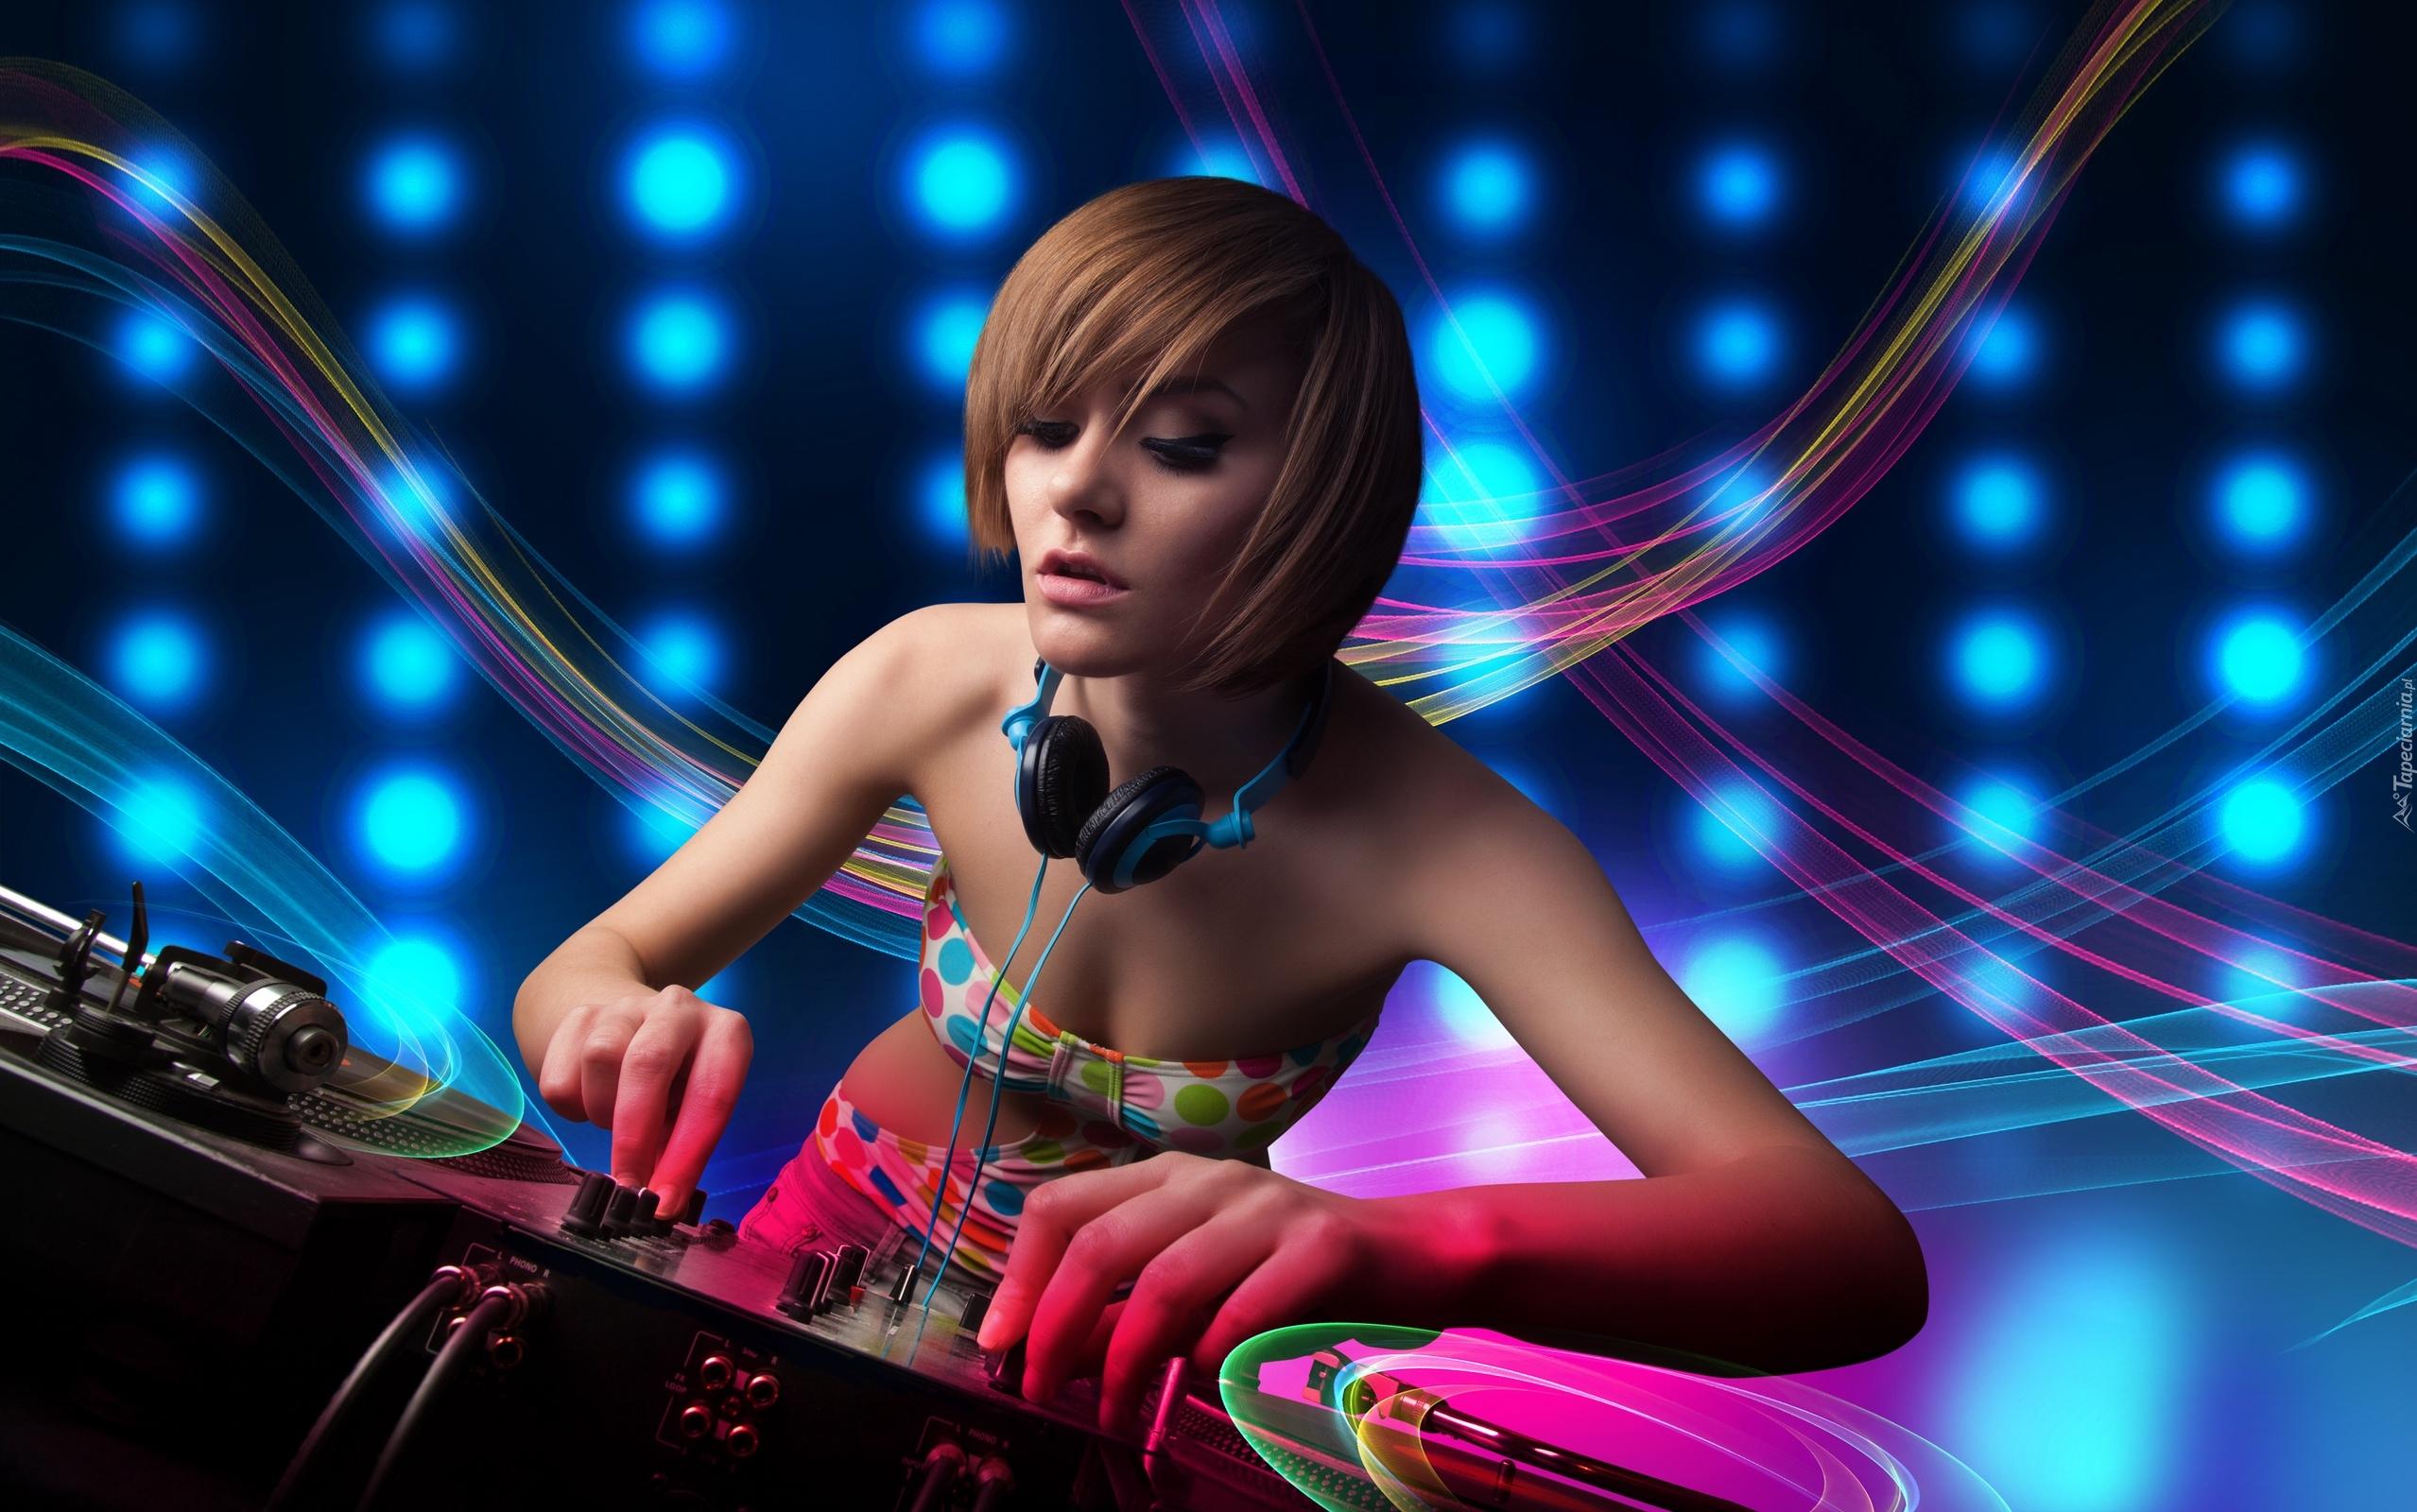 Electro Wallpaper Girl Tapety Disc Jockey Dj Didżeje